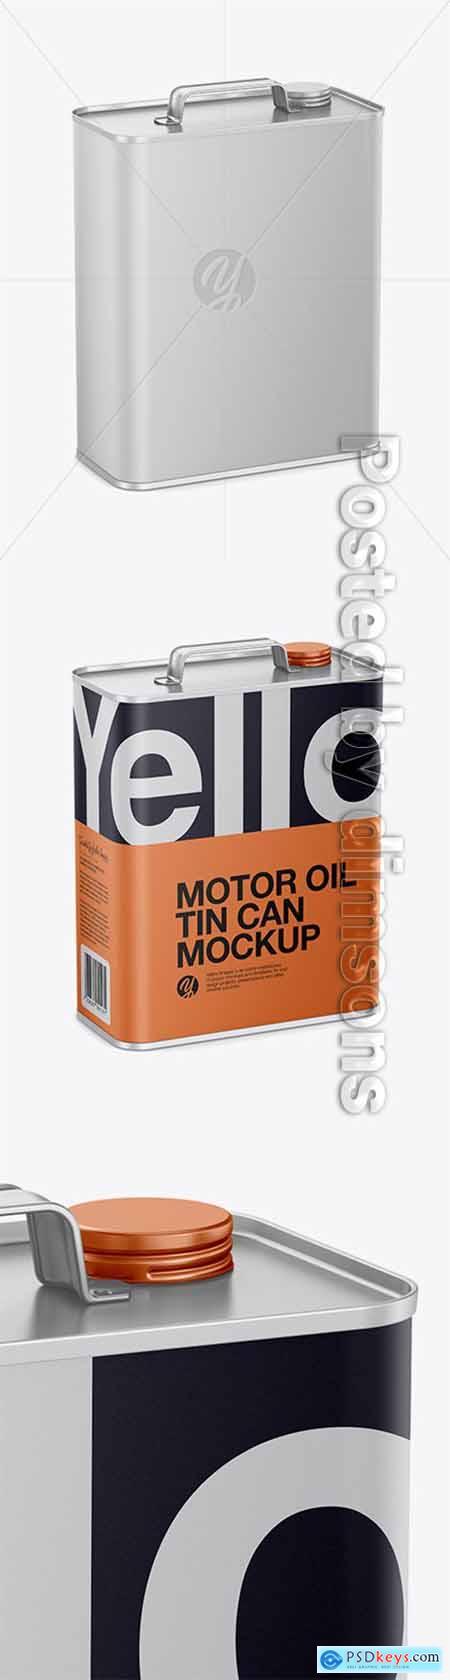 Matte Motor Oil Tin Can Mockup - Half Side View (High-Angle Shot) 28450